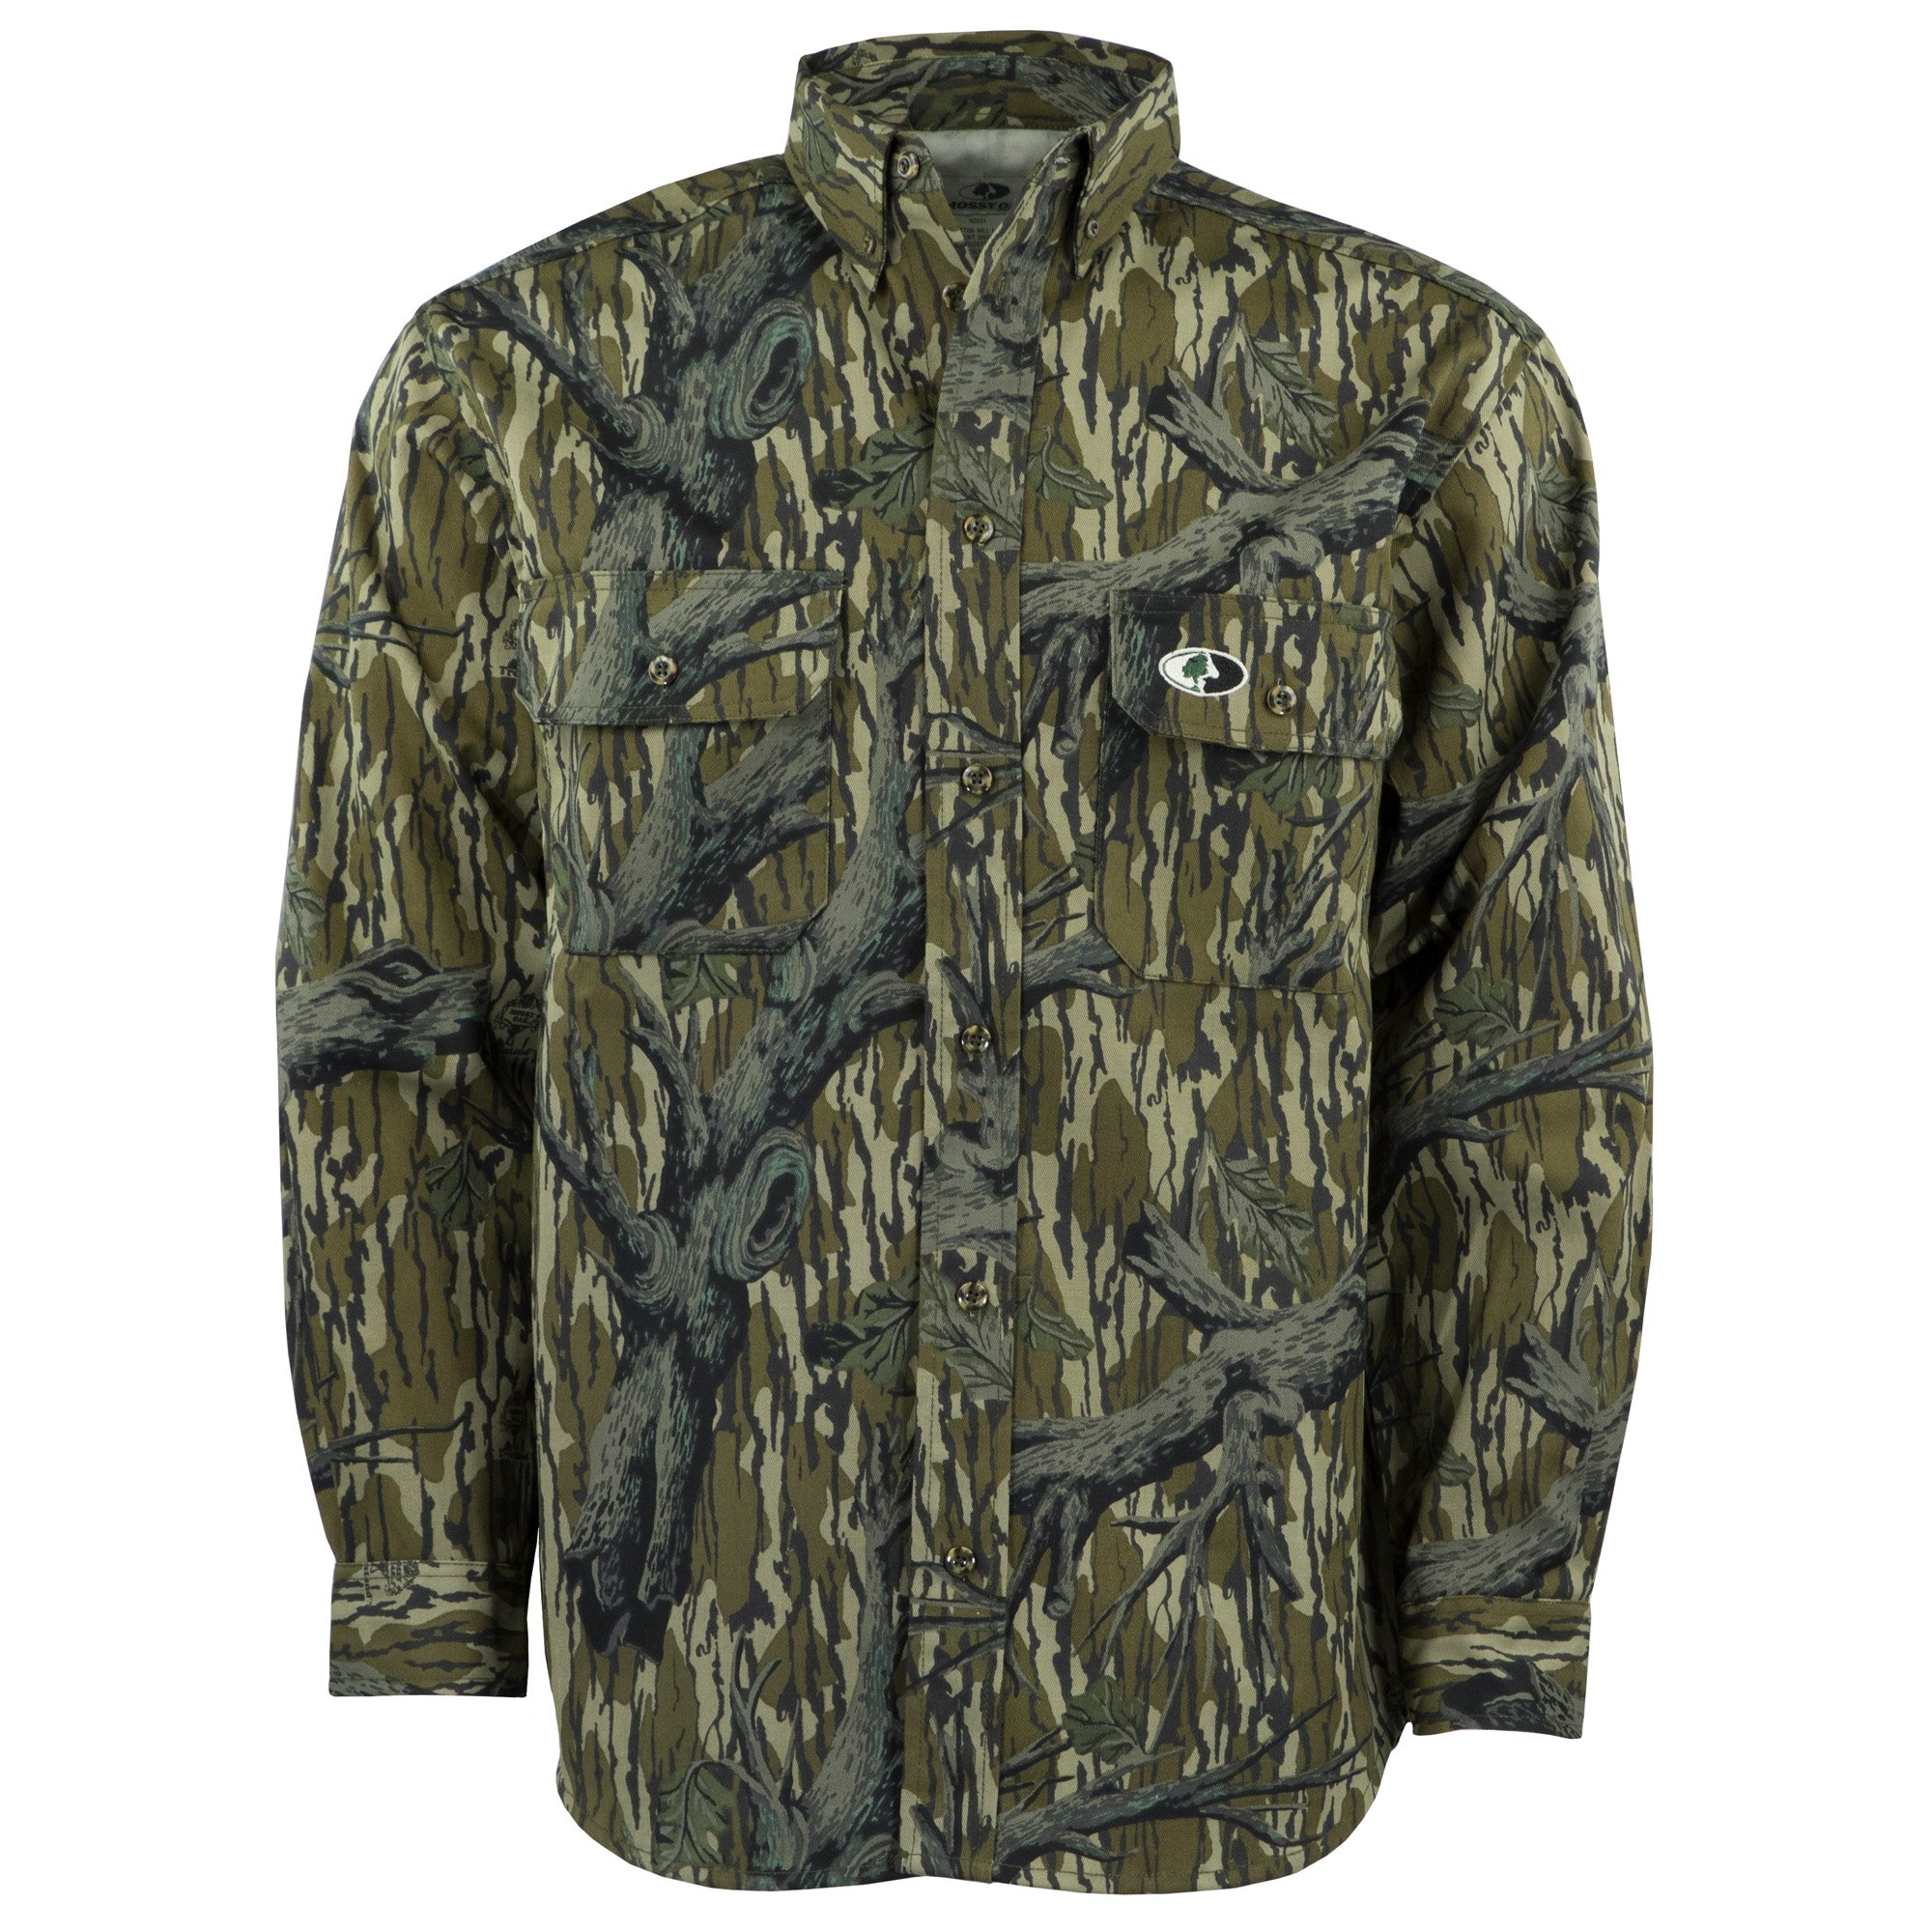 Mossy Oak Camouflage Cotton Mill Hunt Shirt, Original Treestand, 2X